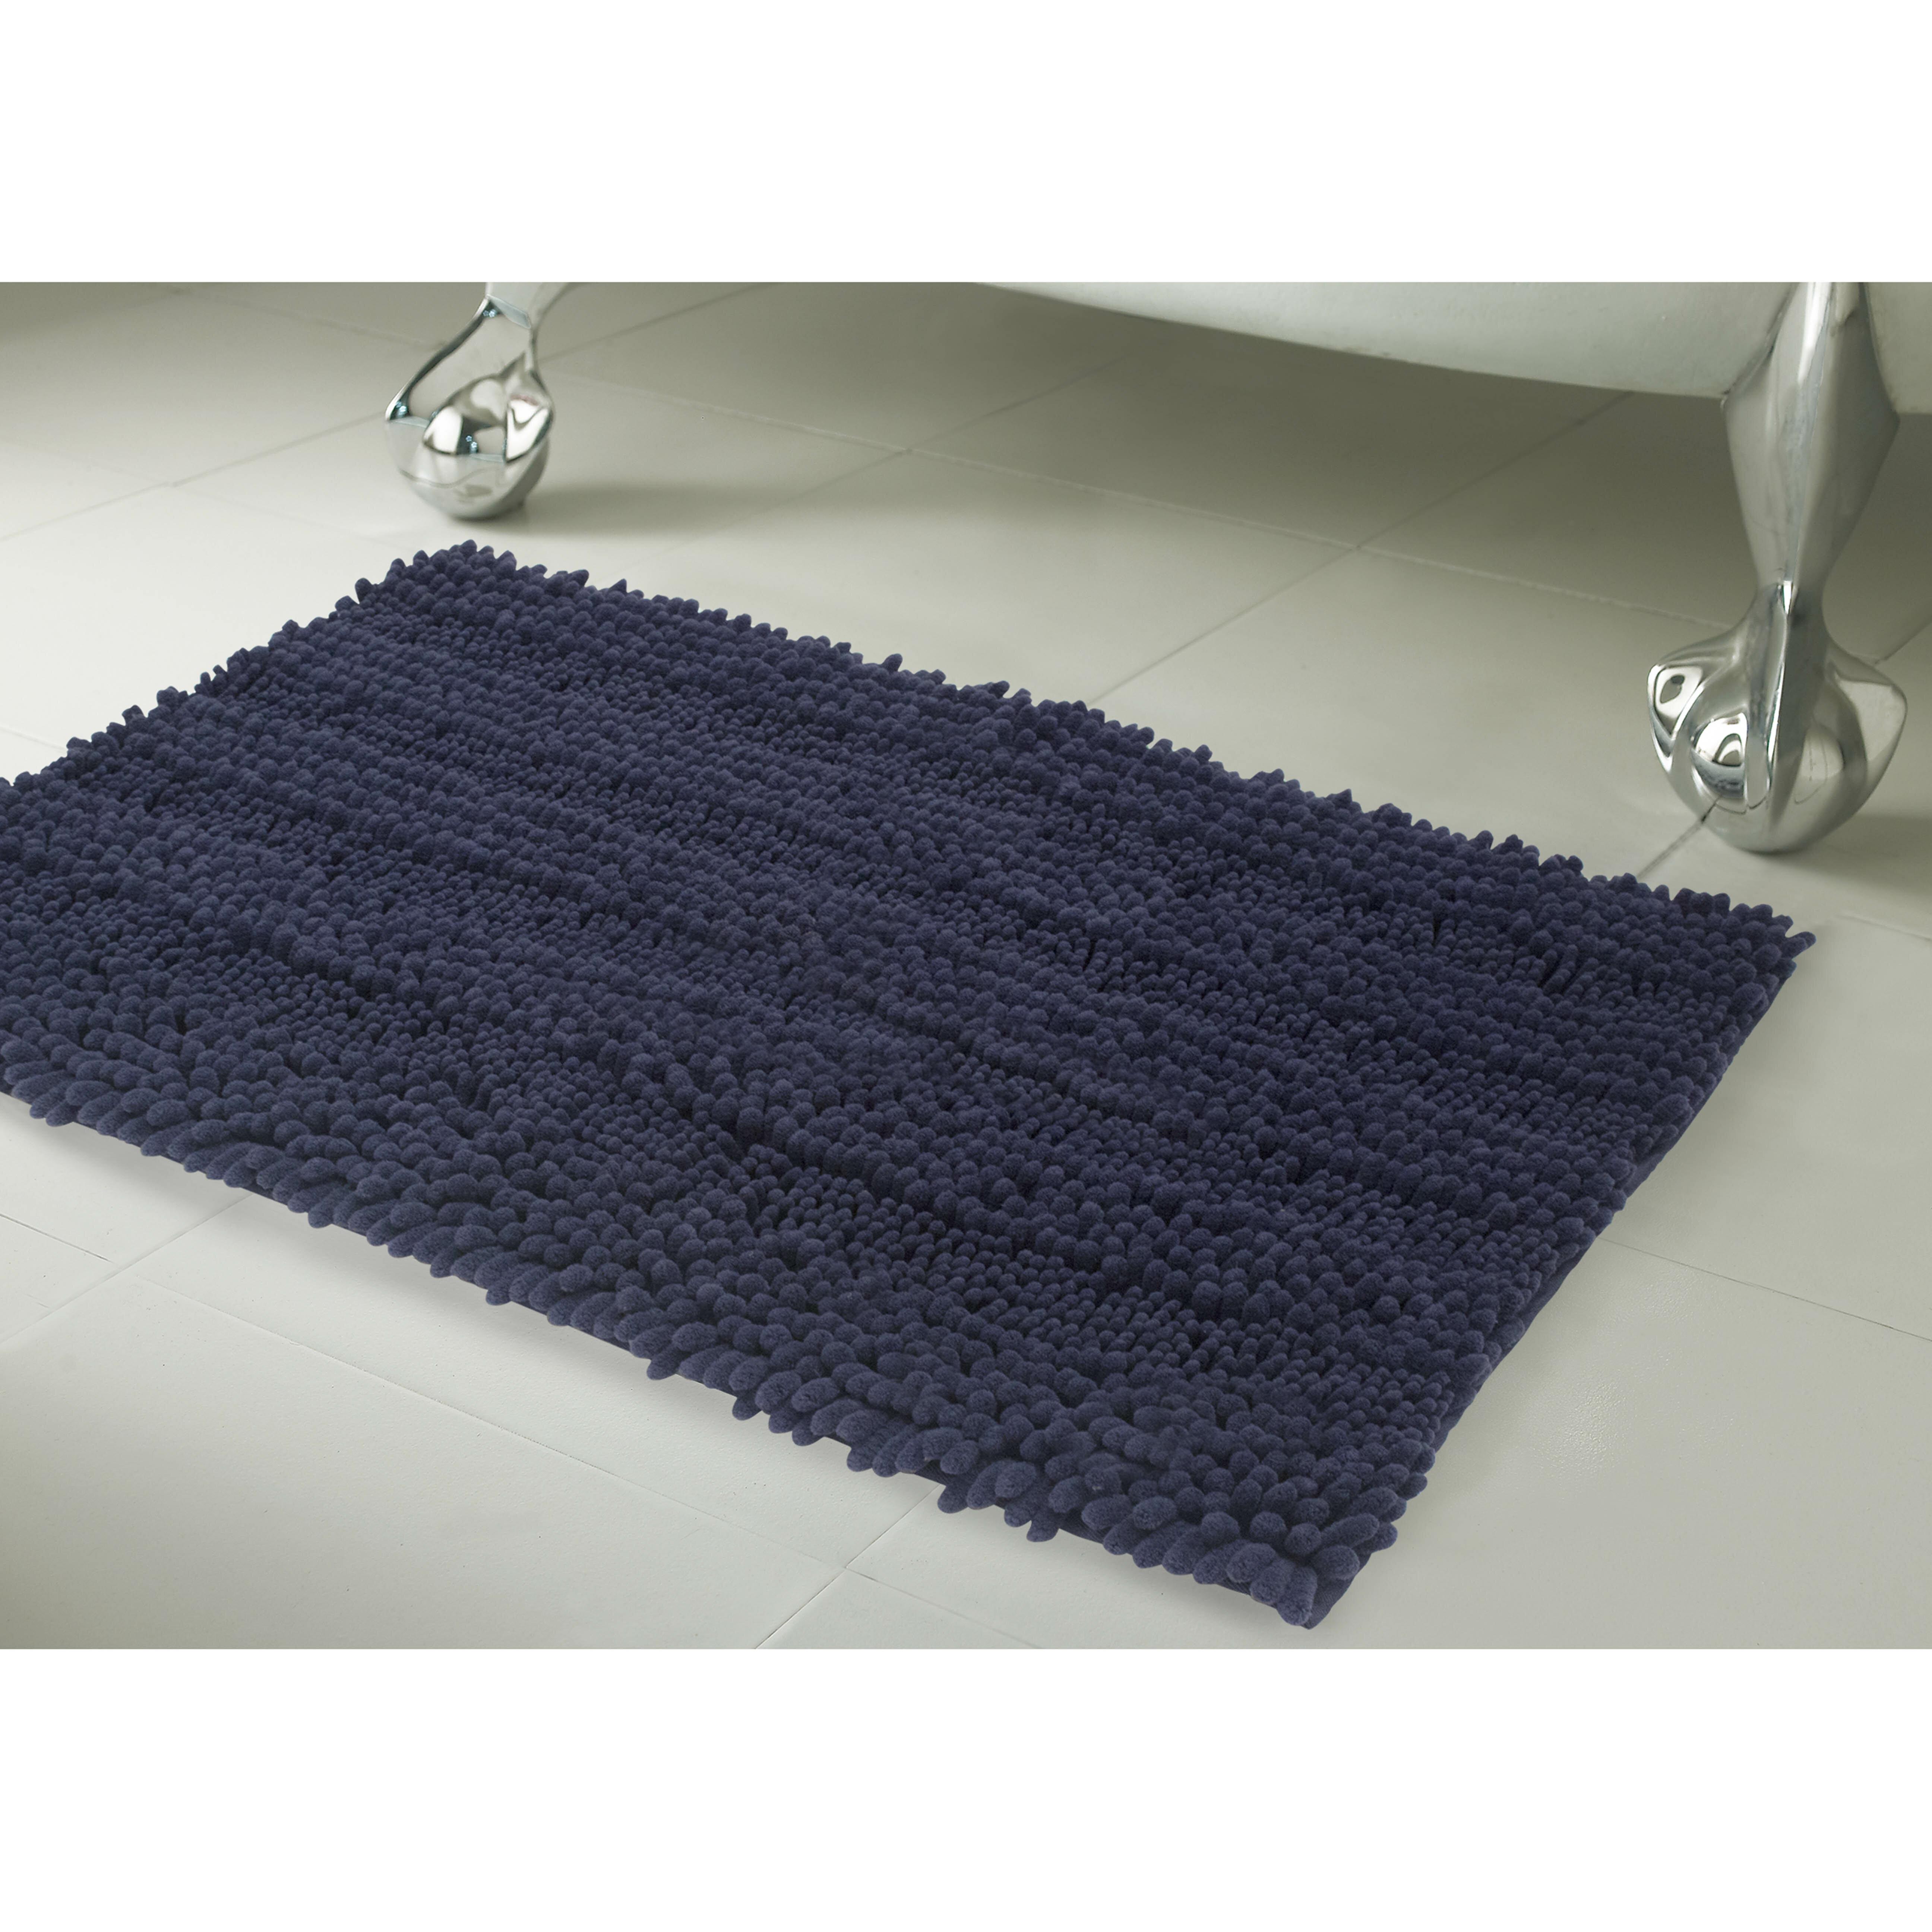 Laura Ashley Home Astor Bath Rug U0026 Reviews | Wayfair